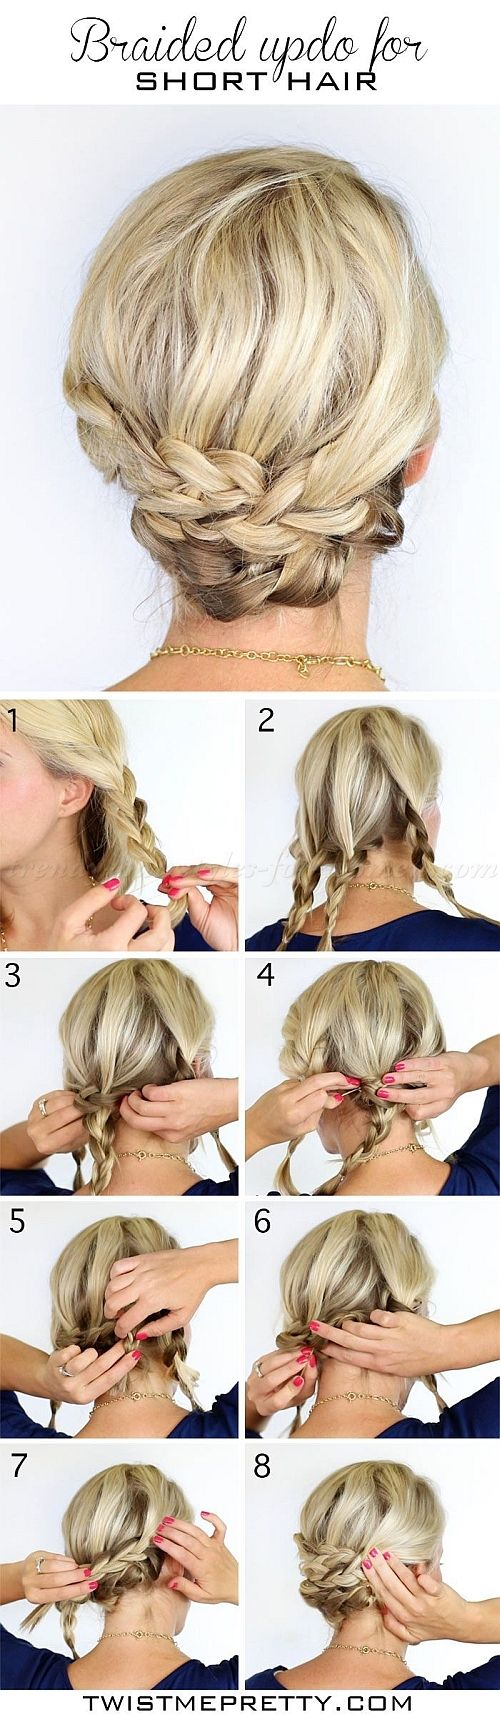 hairstyle tutorials, hairstyles step by step - braided updo hair tutorial